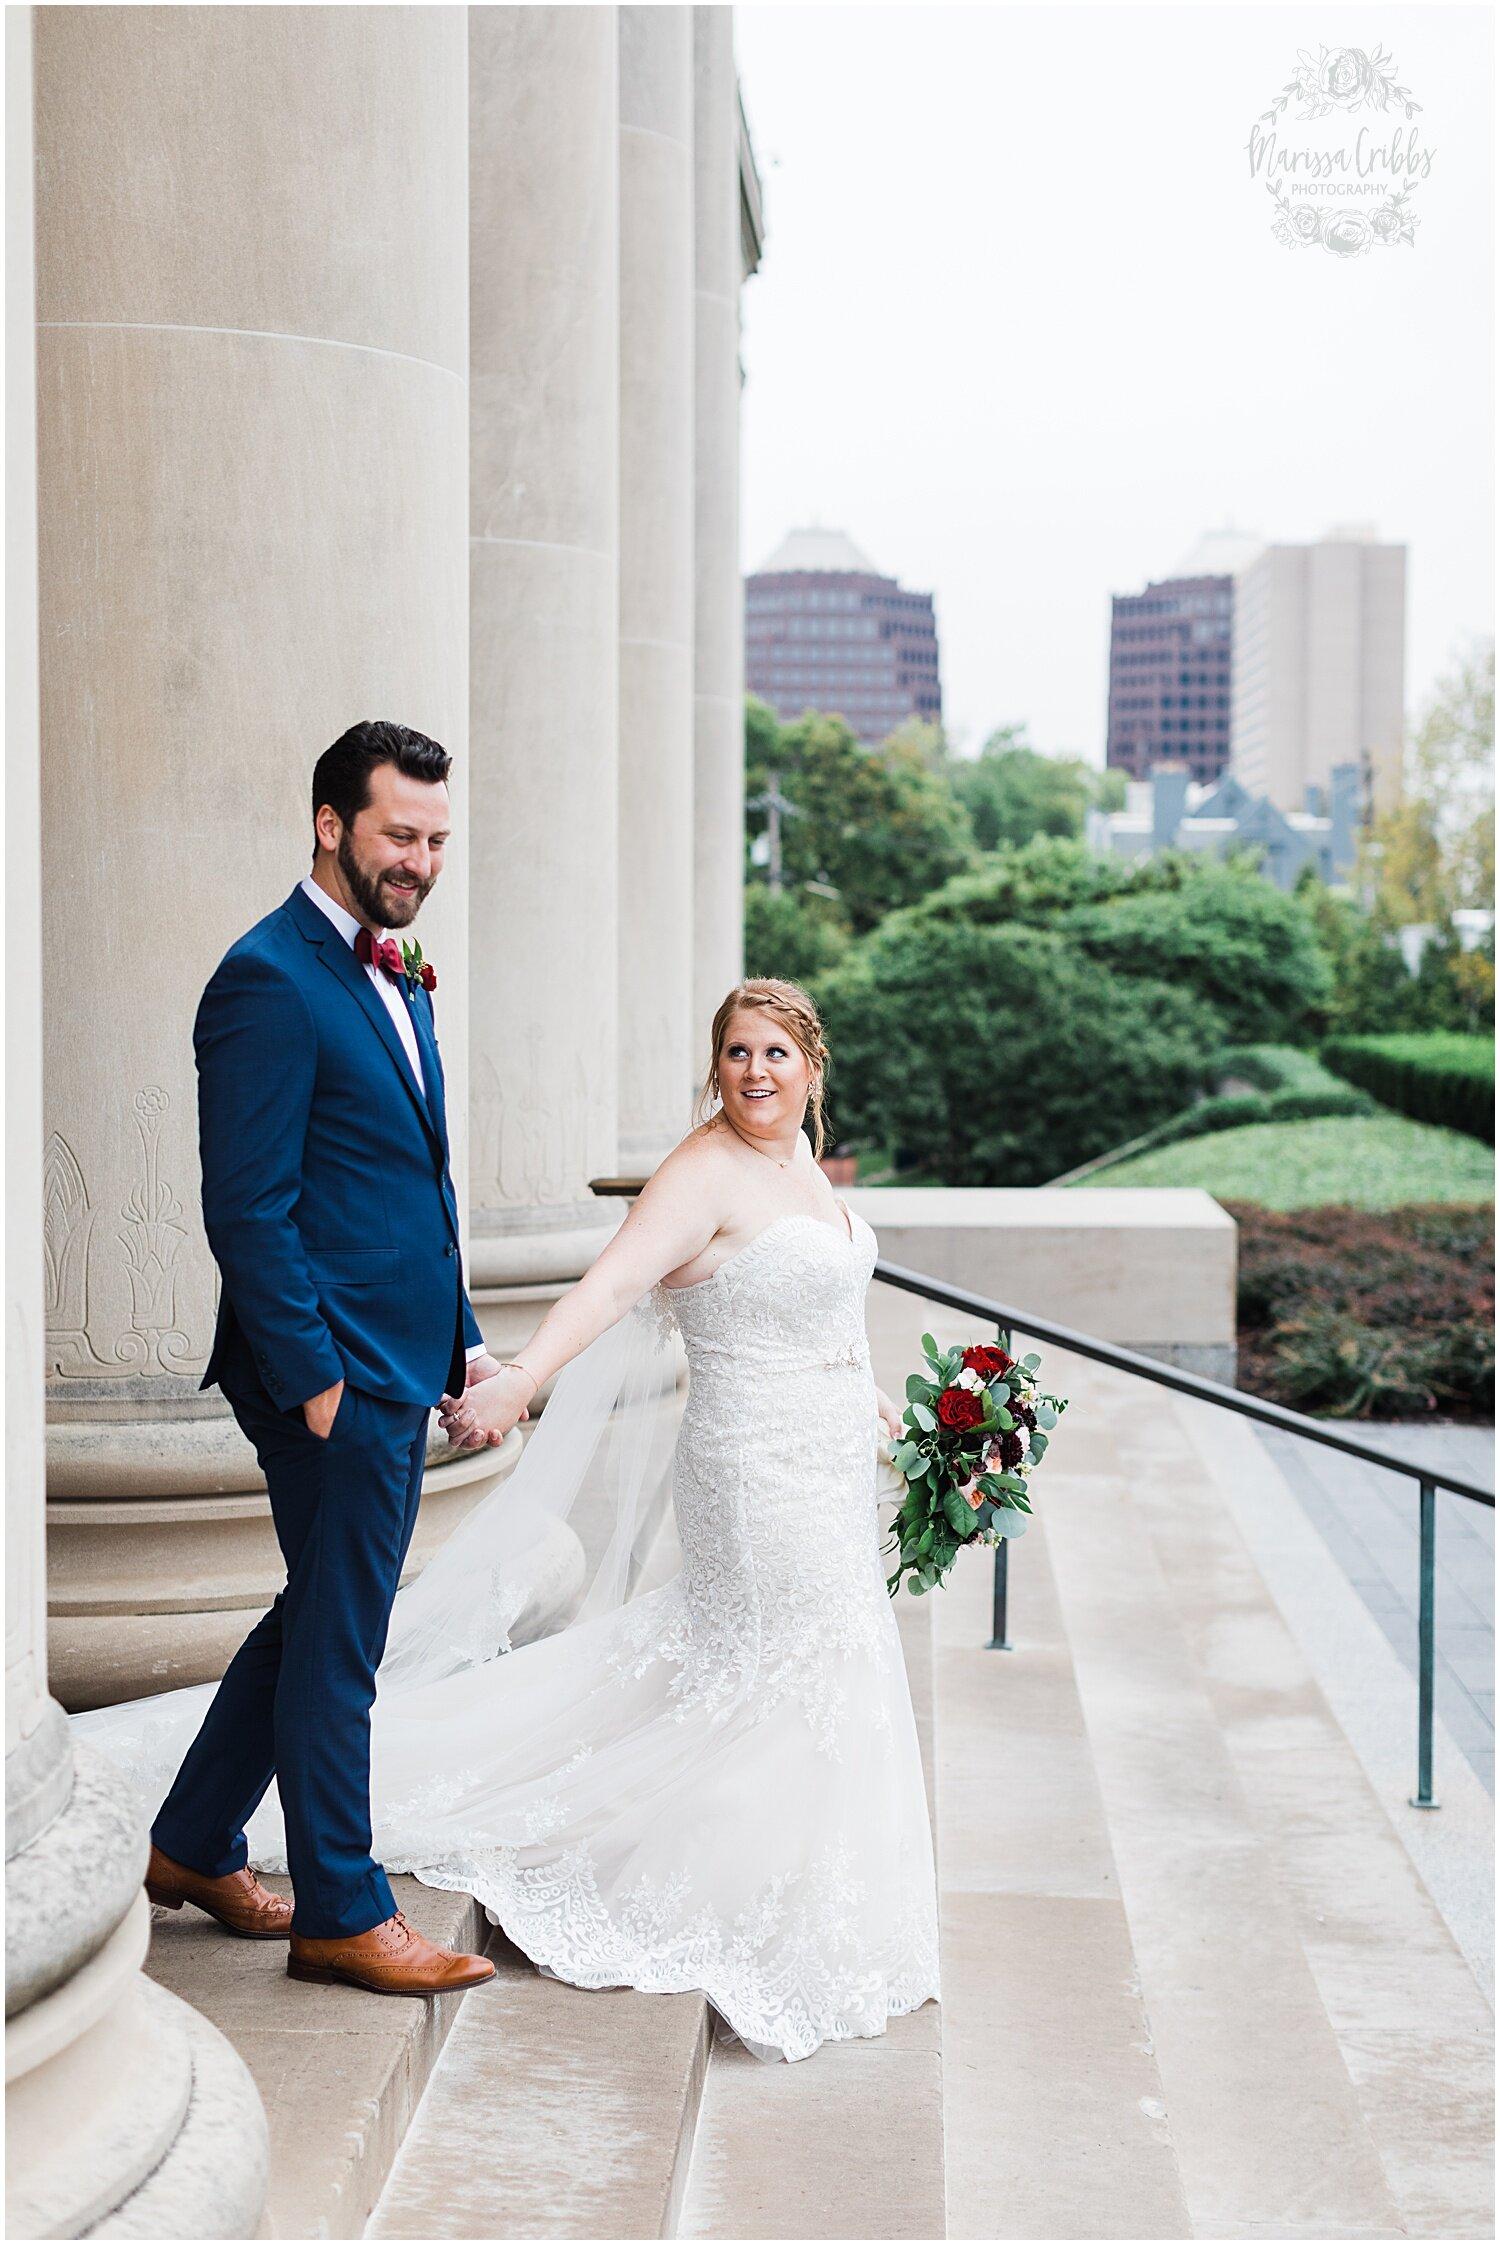 ANNA & LUKE MARRIED BLOG | MARISSA CRIBBS PHOTOGRAPHY | WESTON RED BARN FARM_9382.jpg